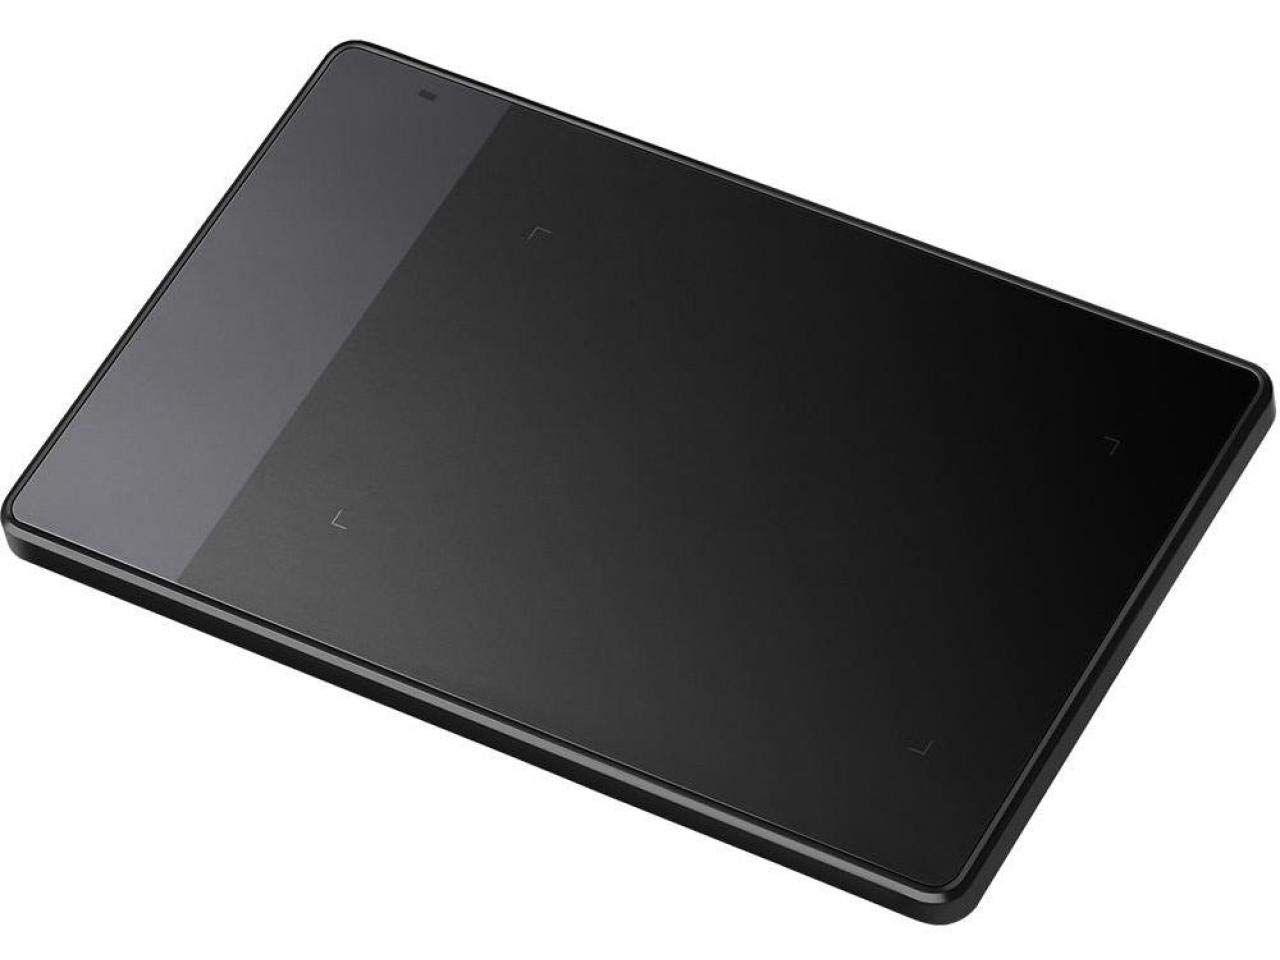 MESA DIGITALIZADORA HUION INSPIROY PEN TABLET BLACK 420